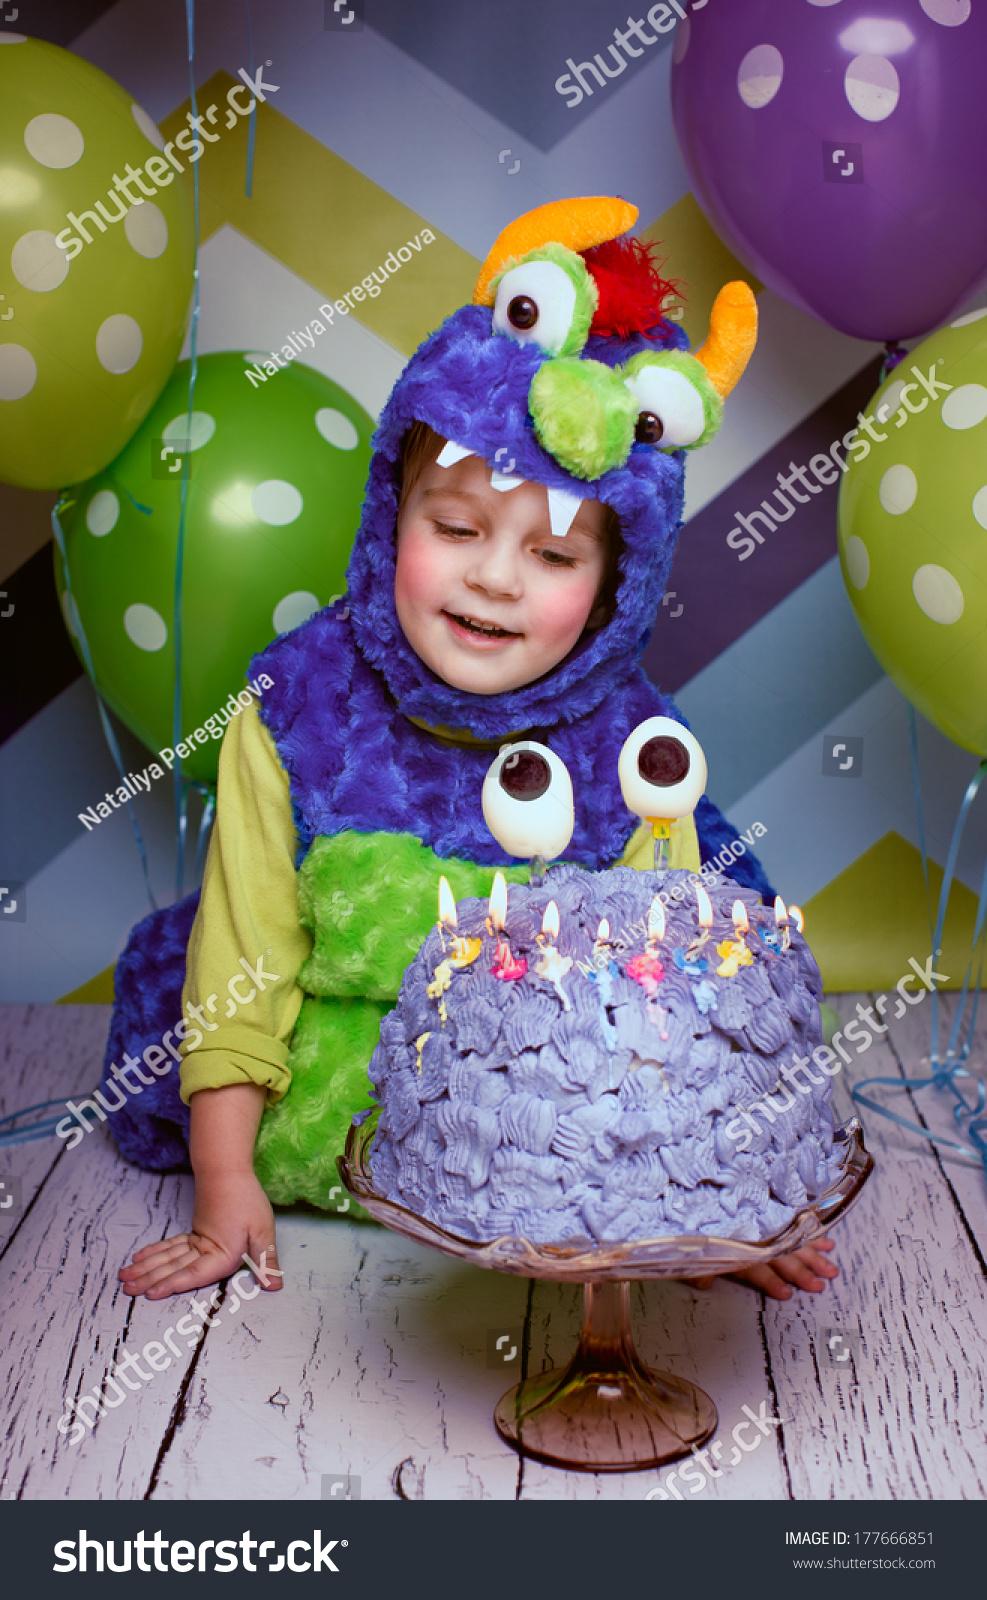 Astonishing Happy Birthday Funny Cake Boy Stock Photo Edit Now 177666851 Personalised Birthday Cards Paralily Jamesorg